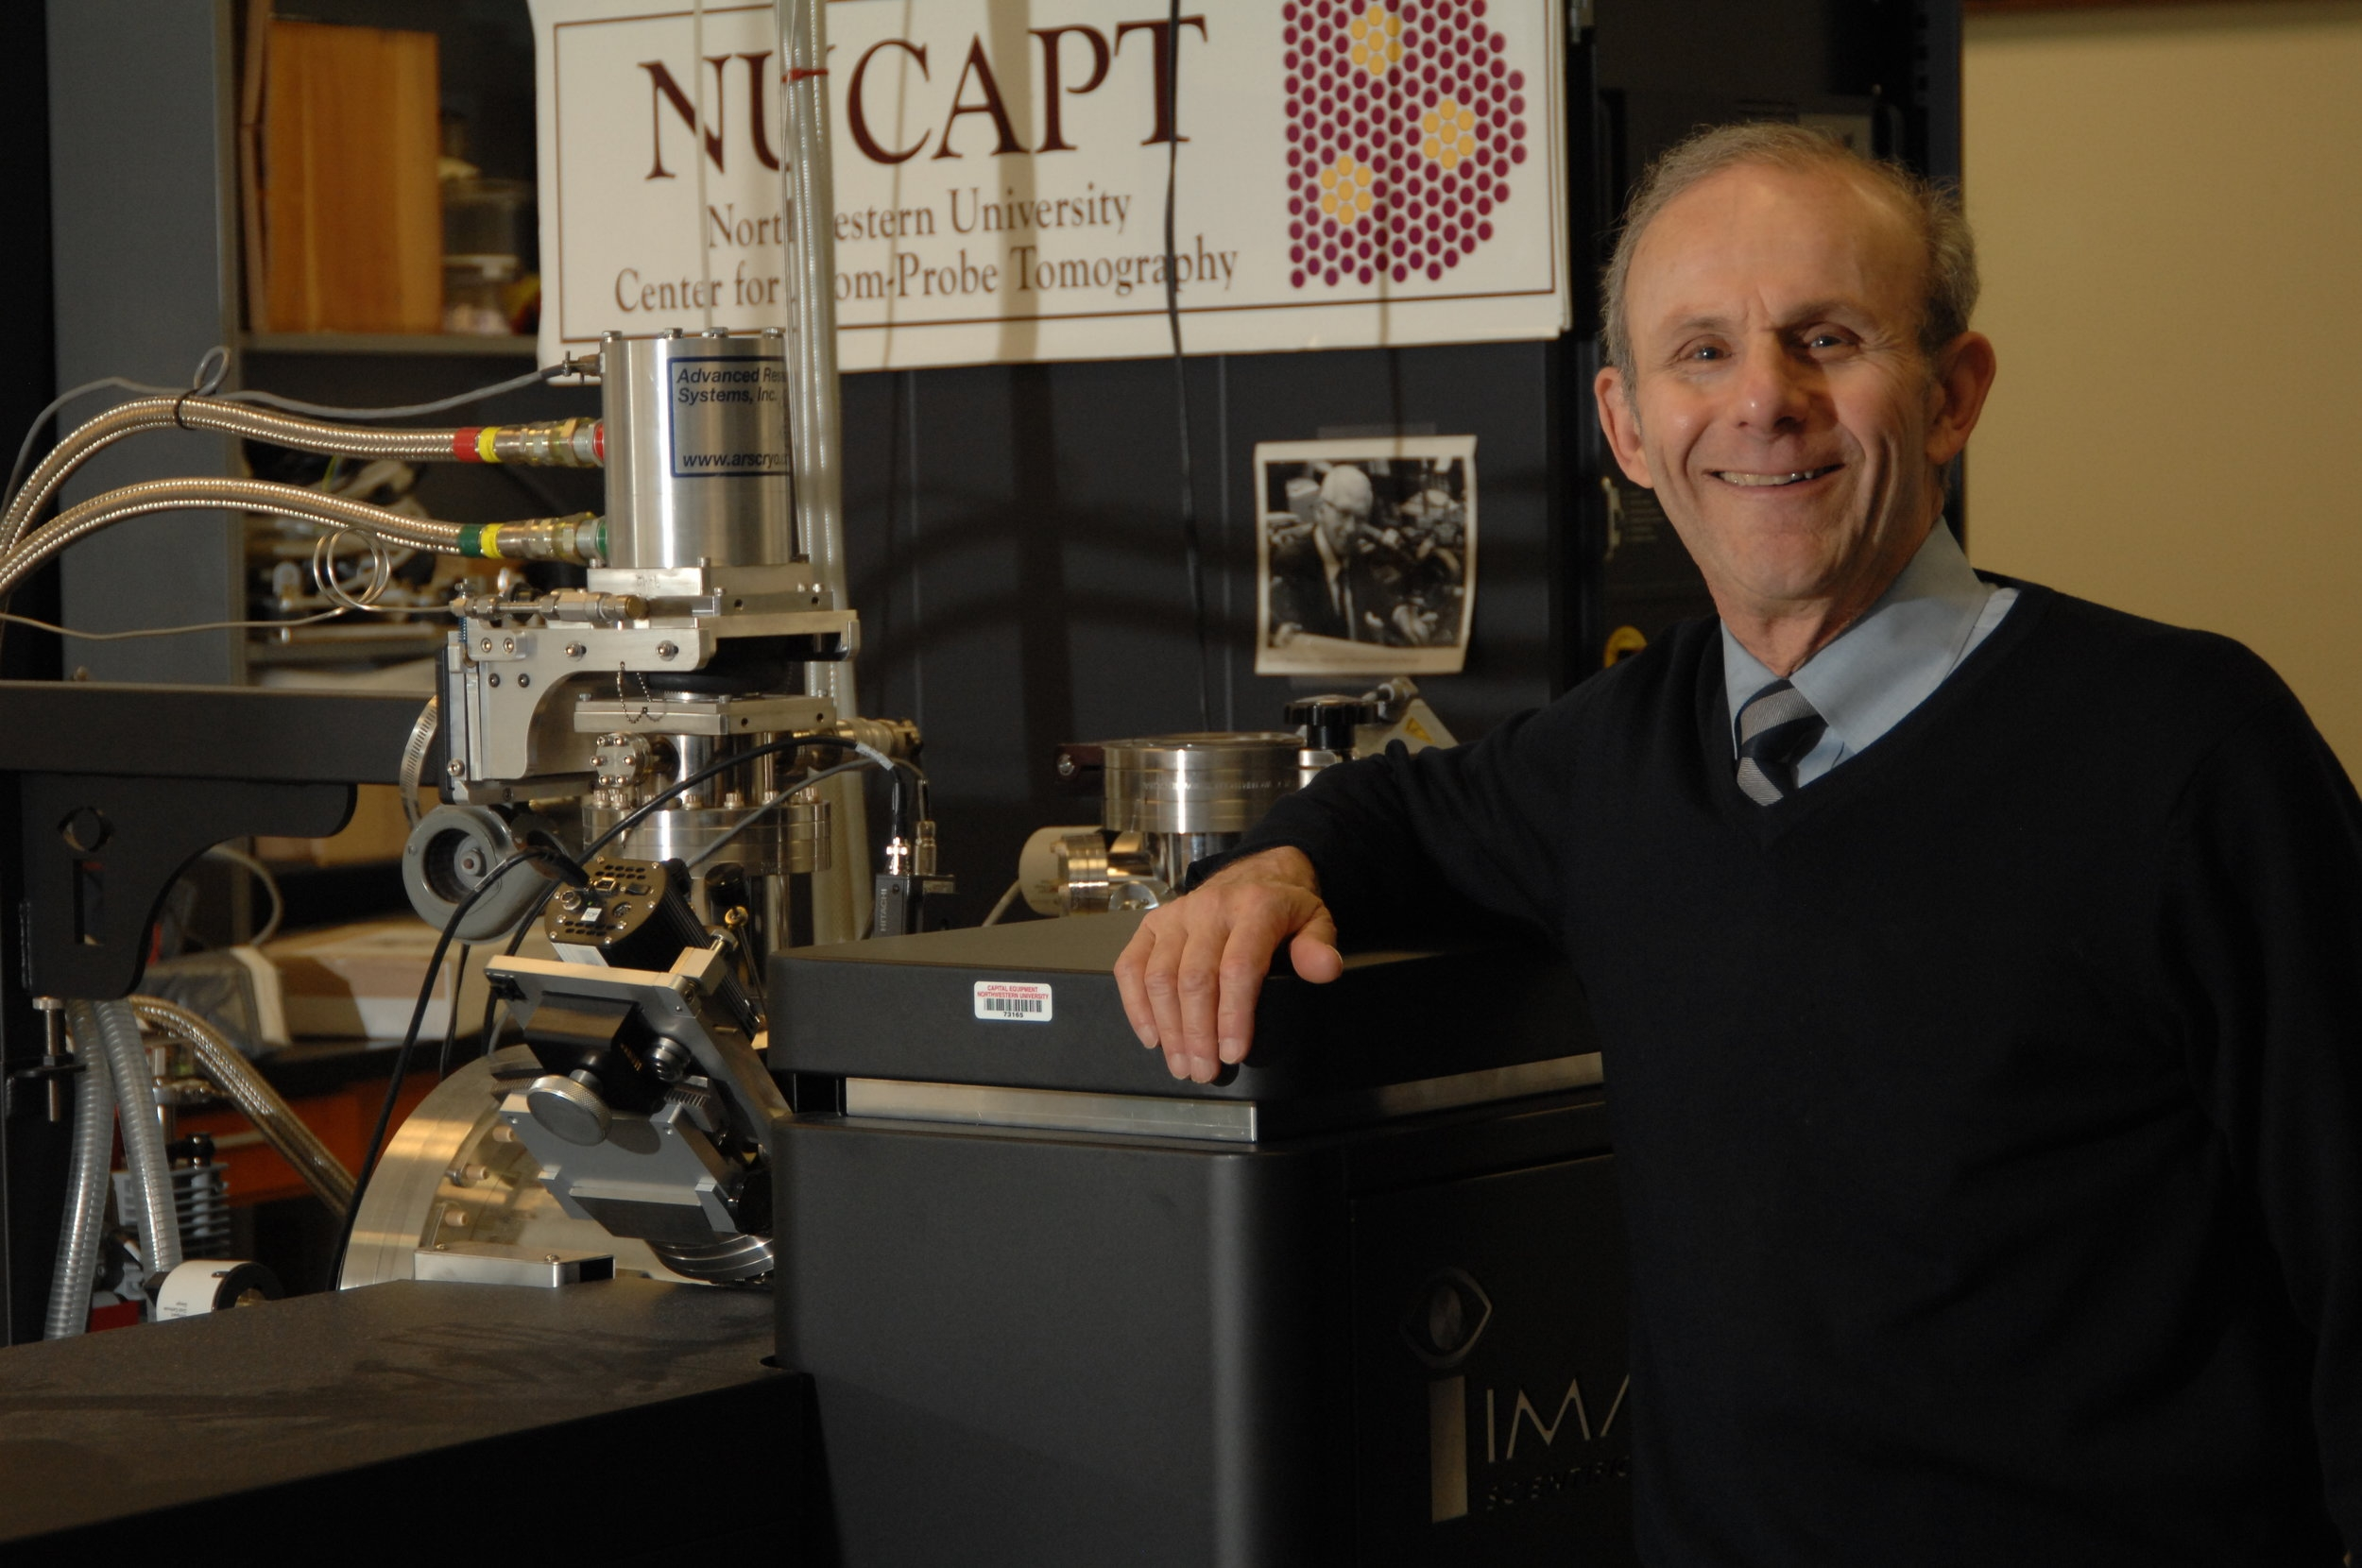 NanoAl Co-Founder, Professor David Seidman, Receives ASM Gold Medal - Professor Seidman will receive the prestigious award at MS&T19.